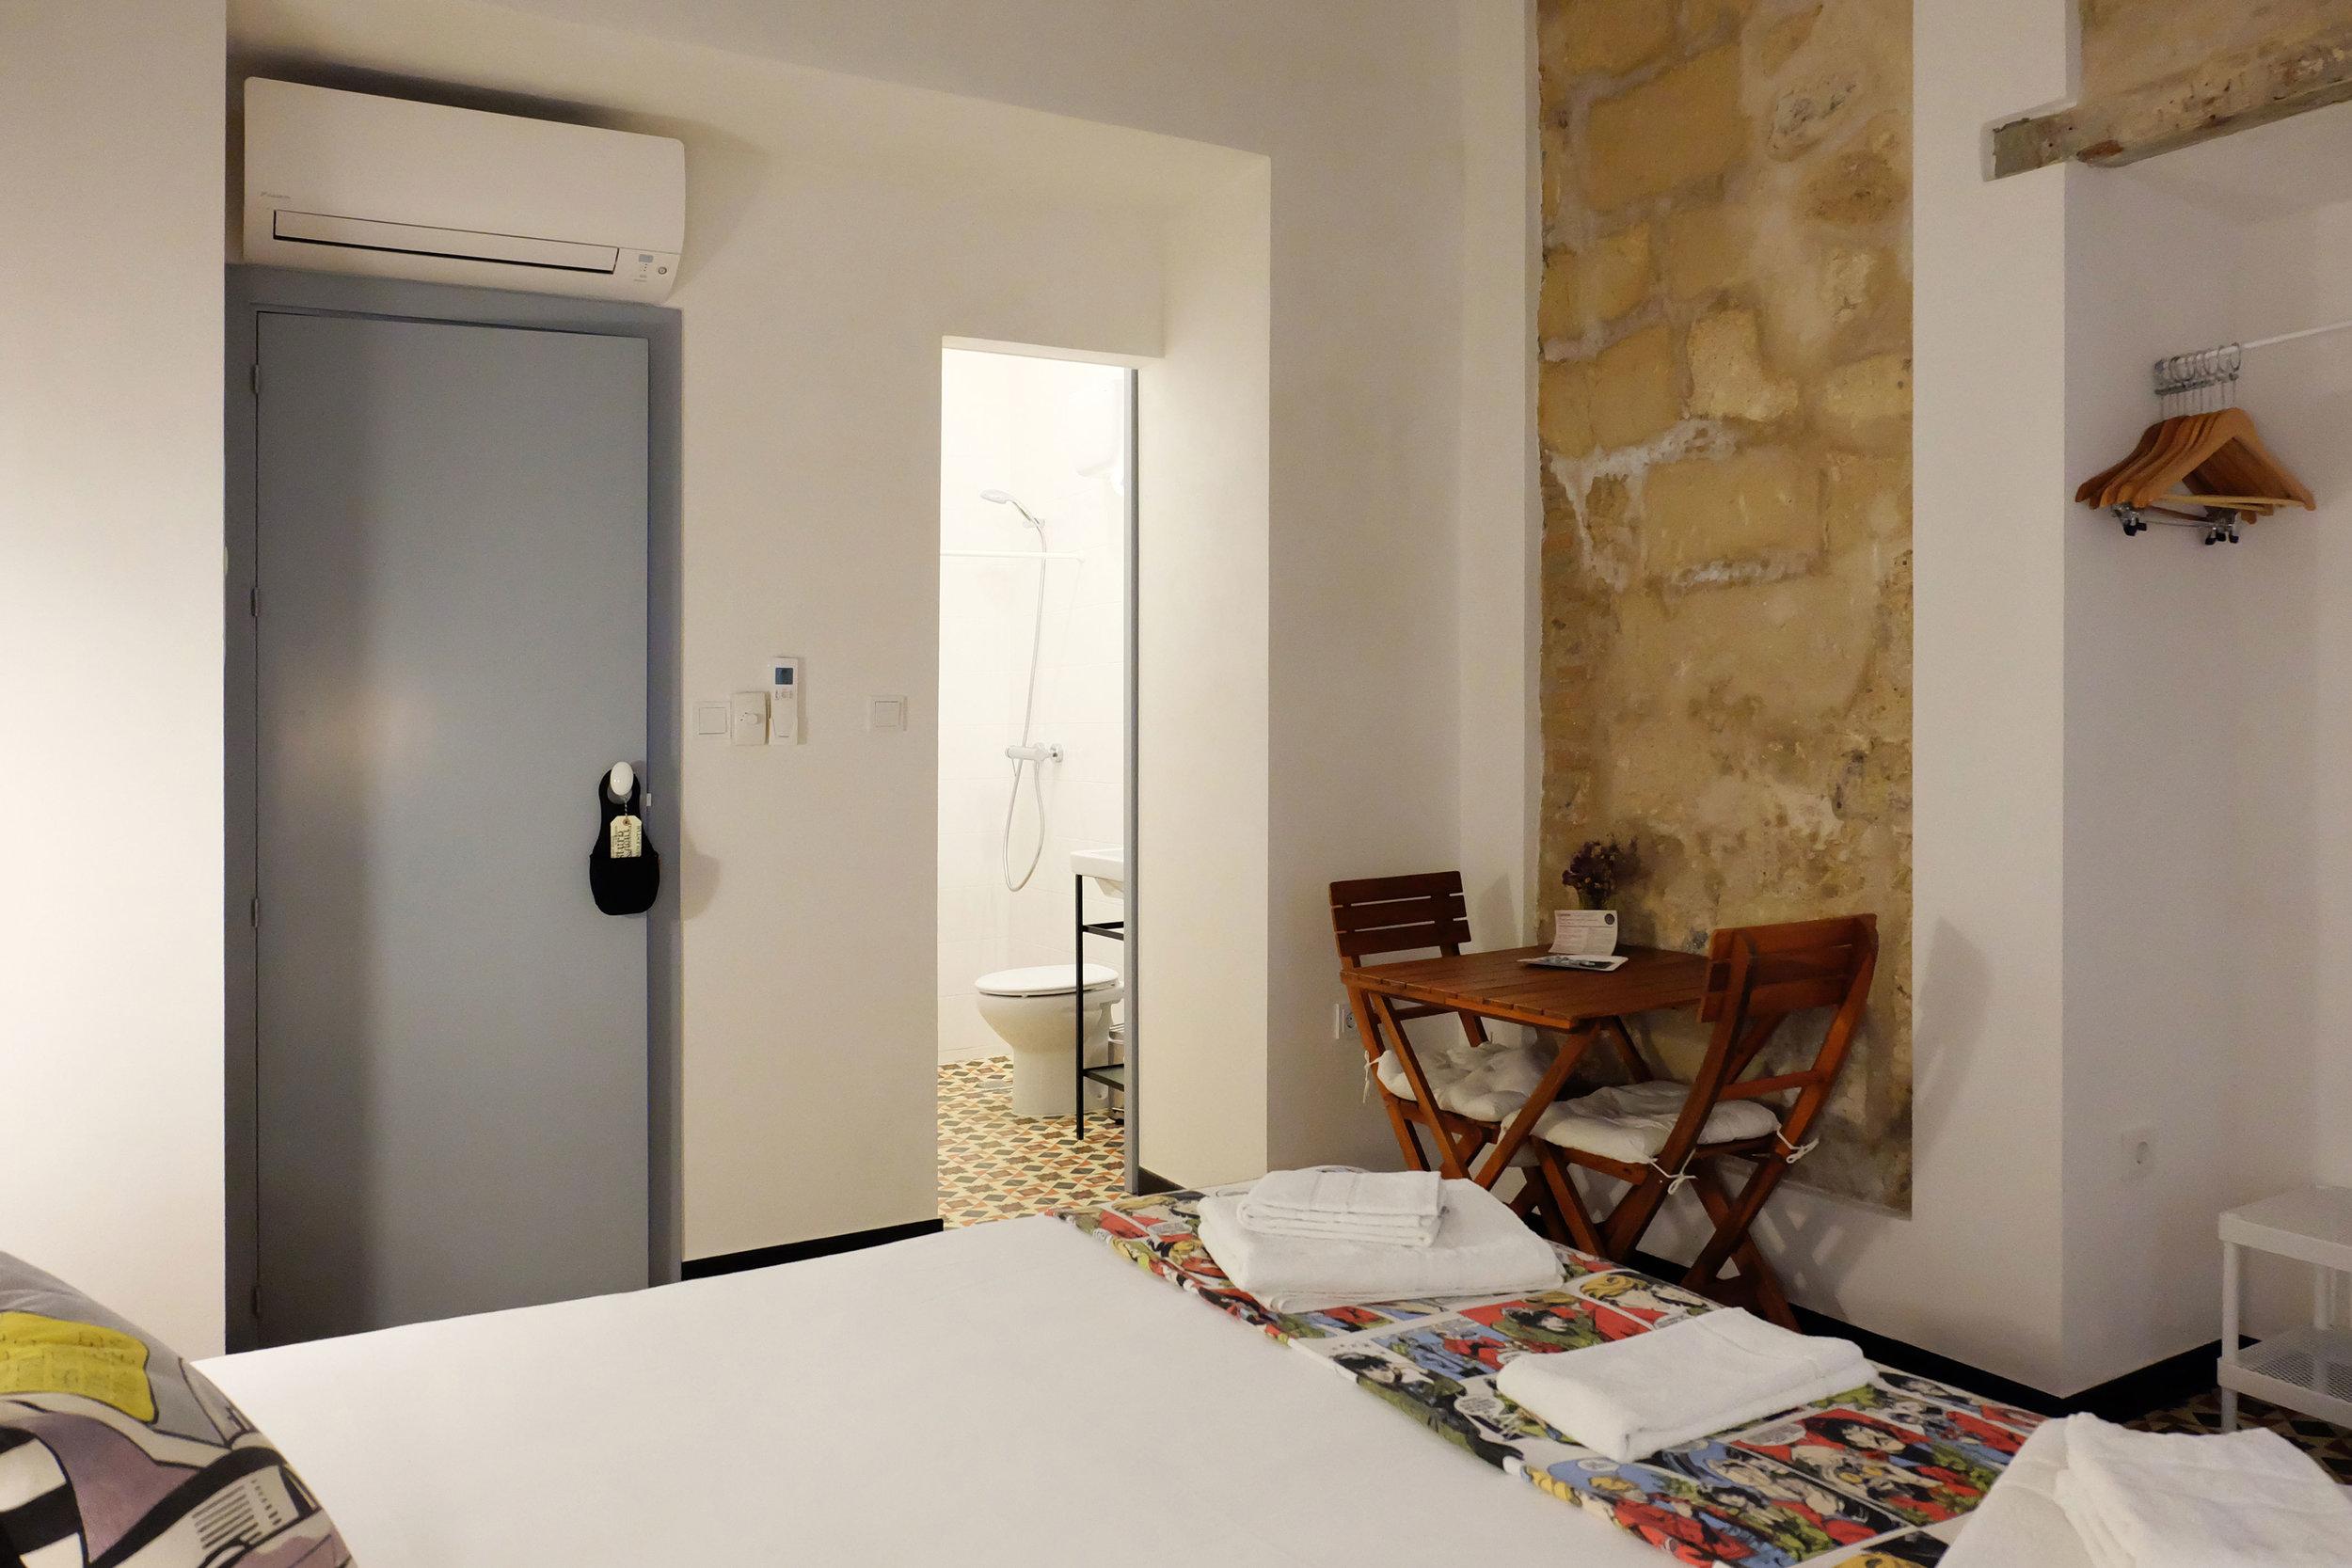 Hotel-Casa-de-Huespedes-Santa-Maria-Habitacion-1-7.jpg